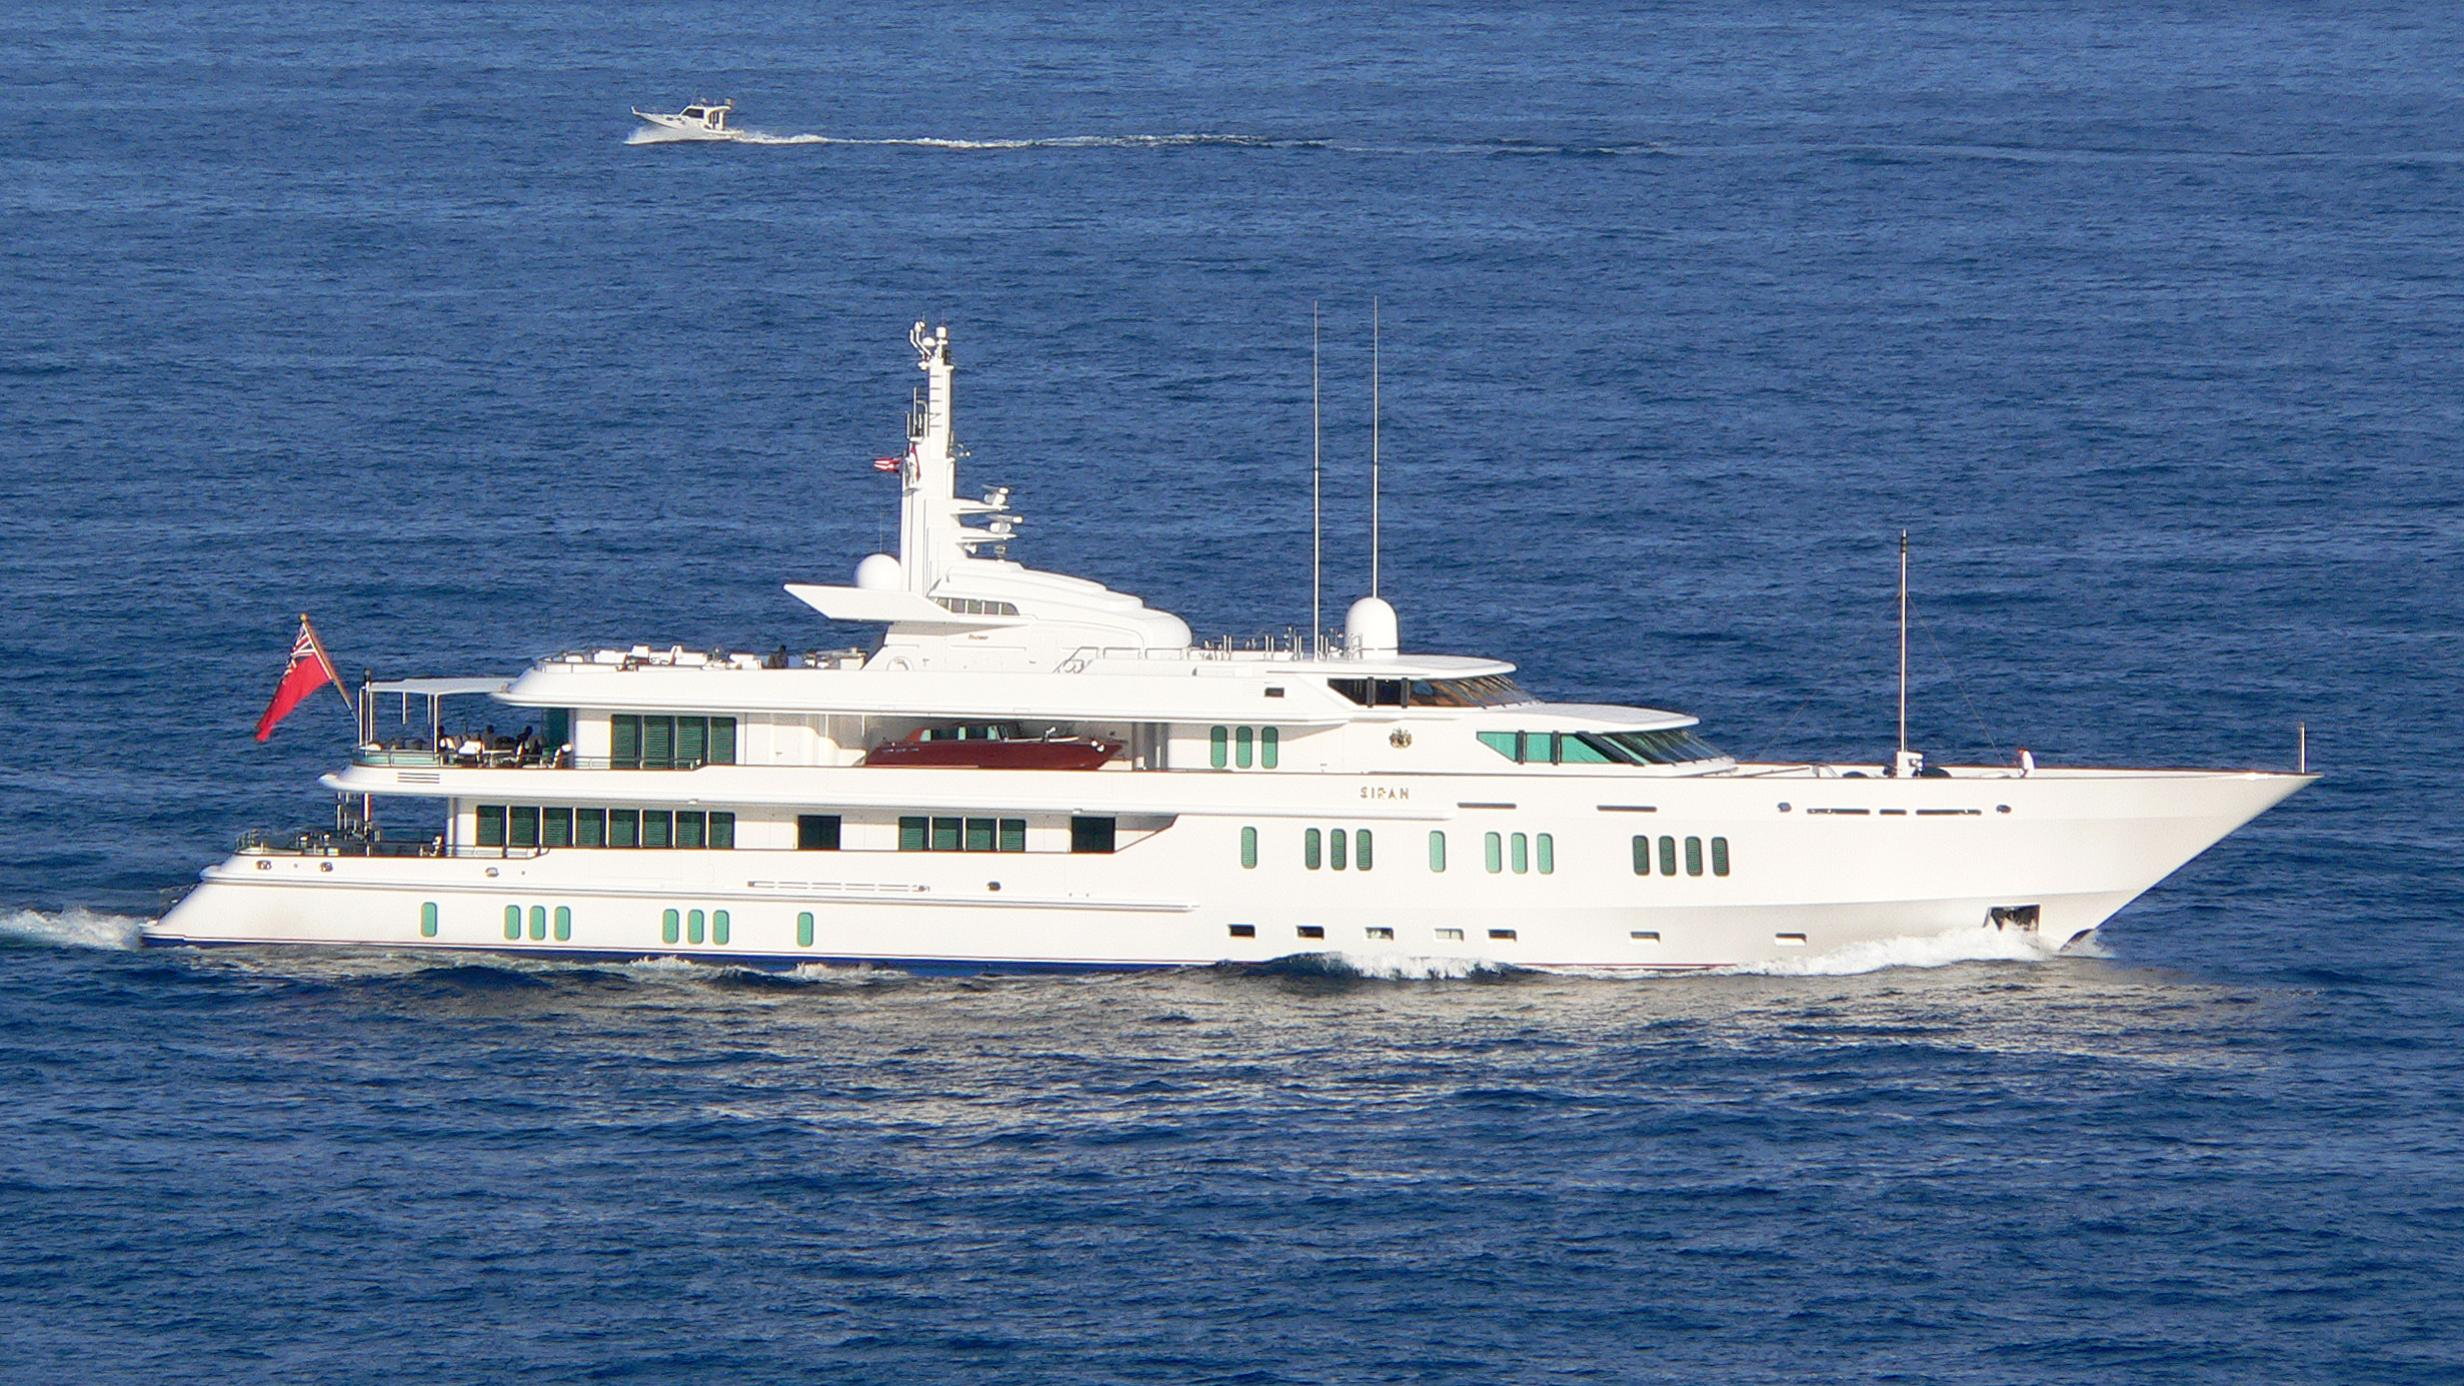 siran-1991-yacht-exterior